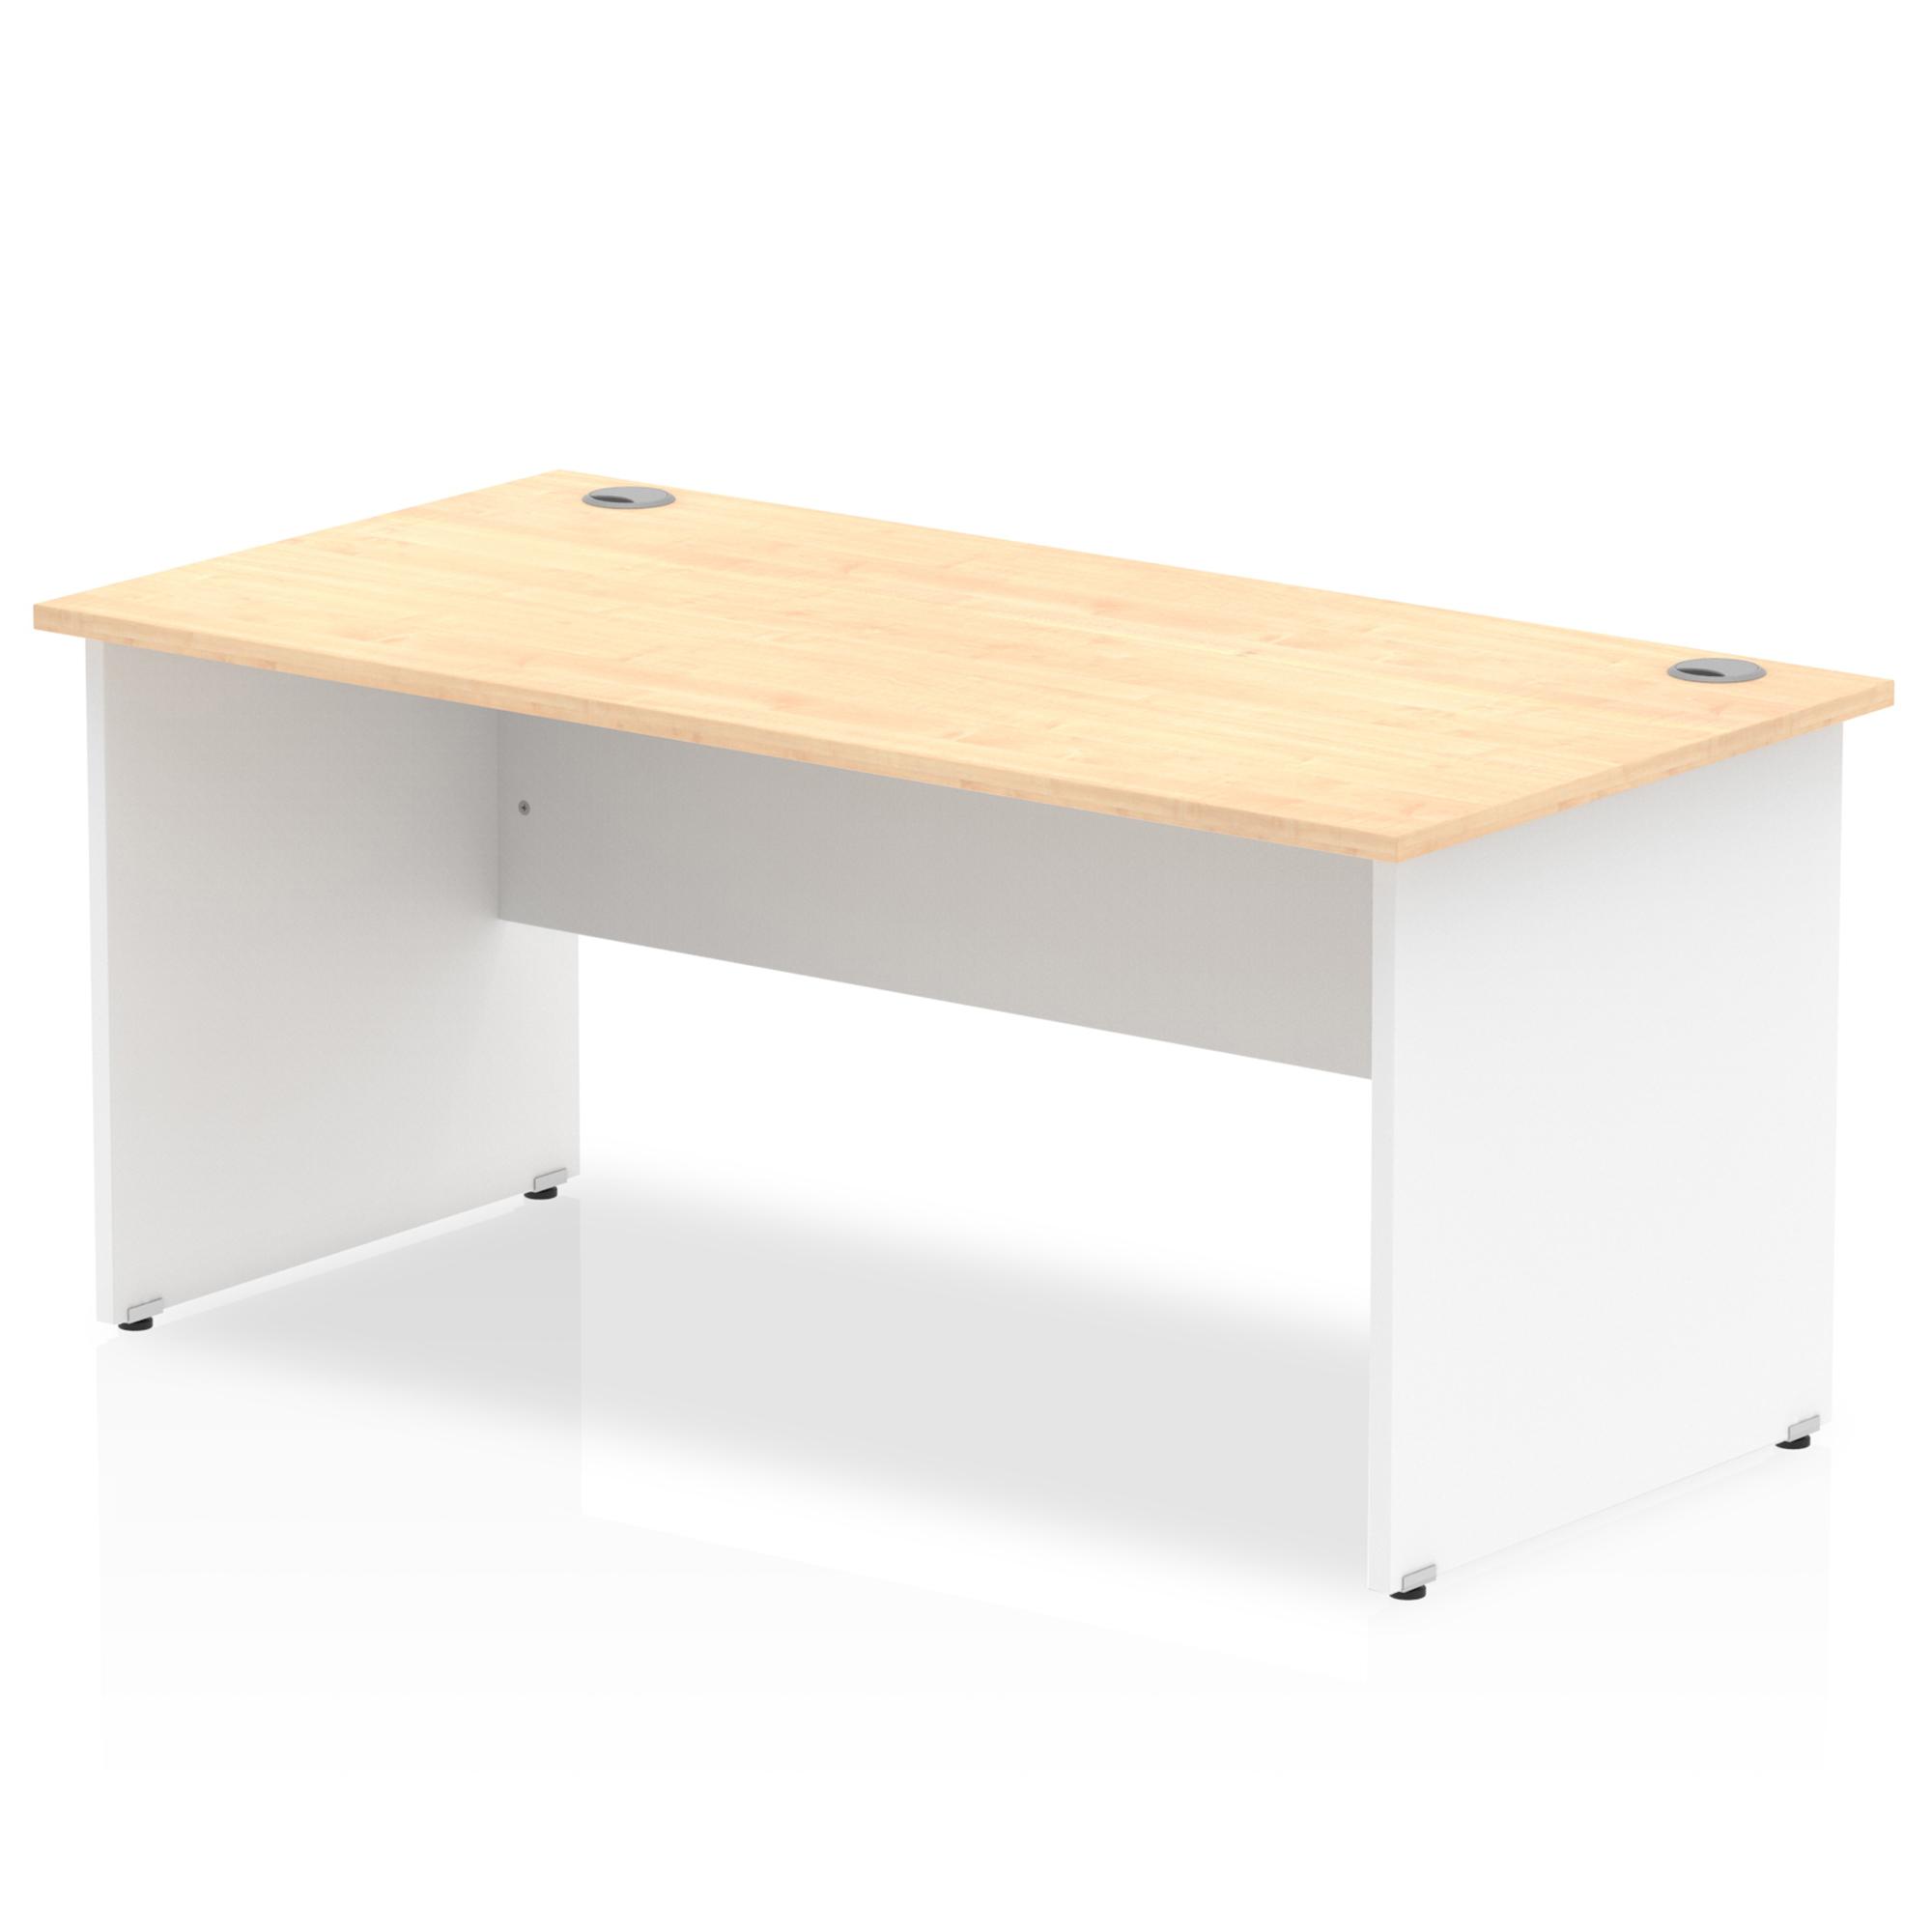 Trexus Desk Rectangle Panel End 1800x800mm Maple Top White Panels Ref TT000112